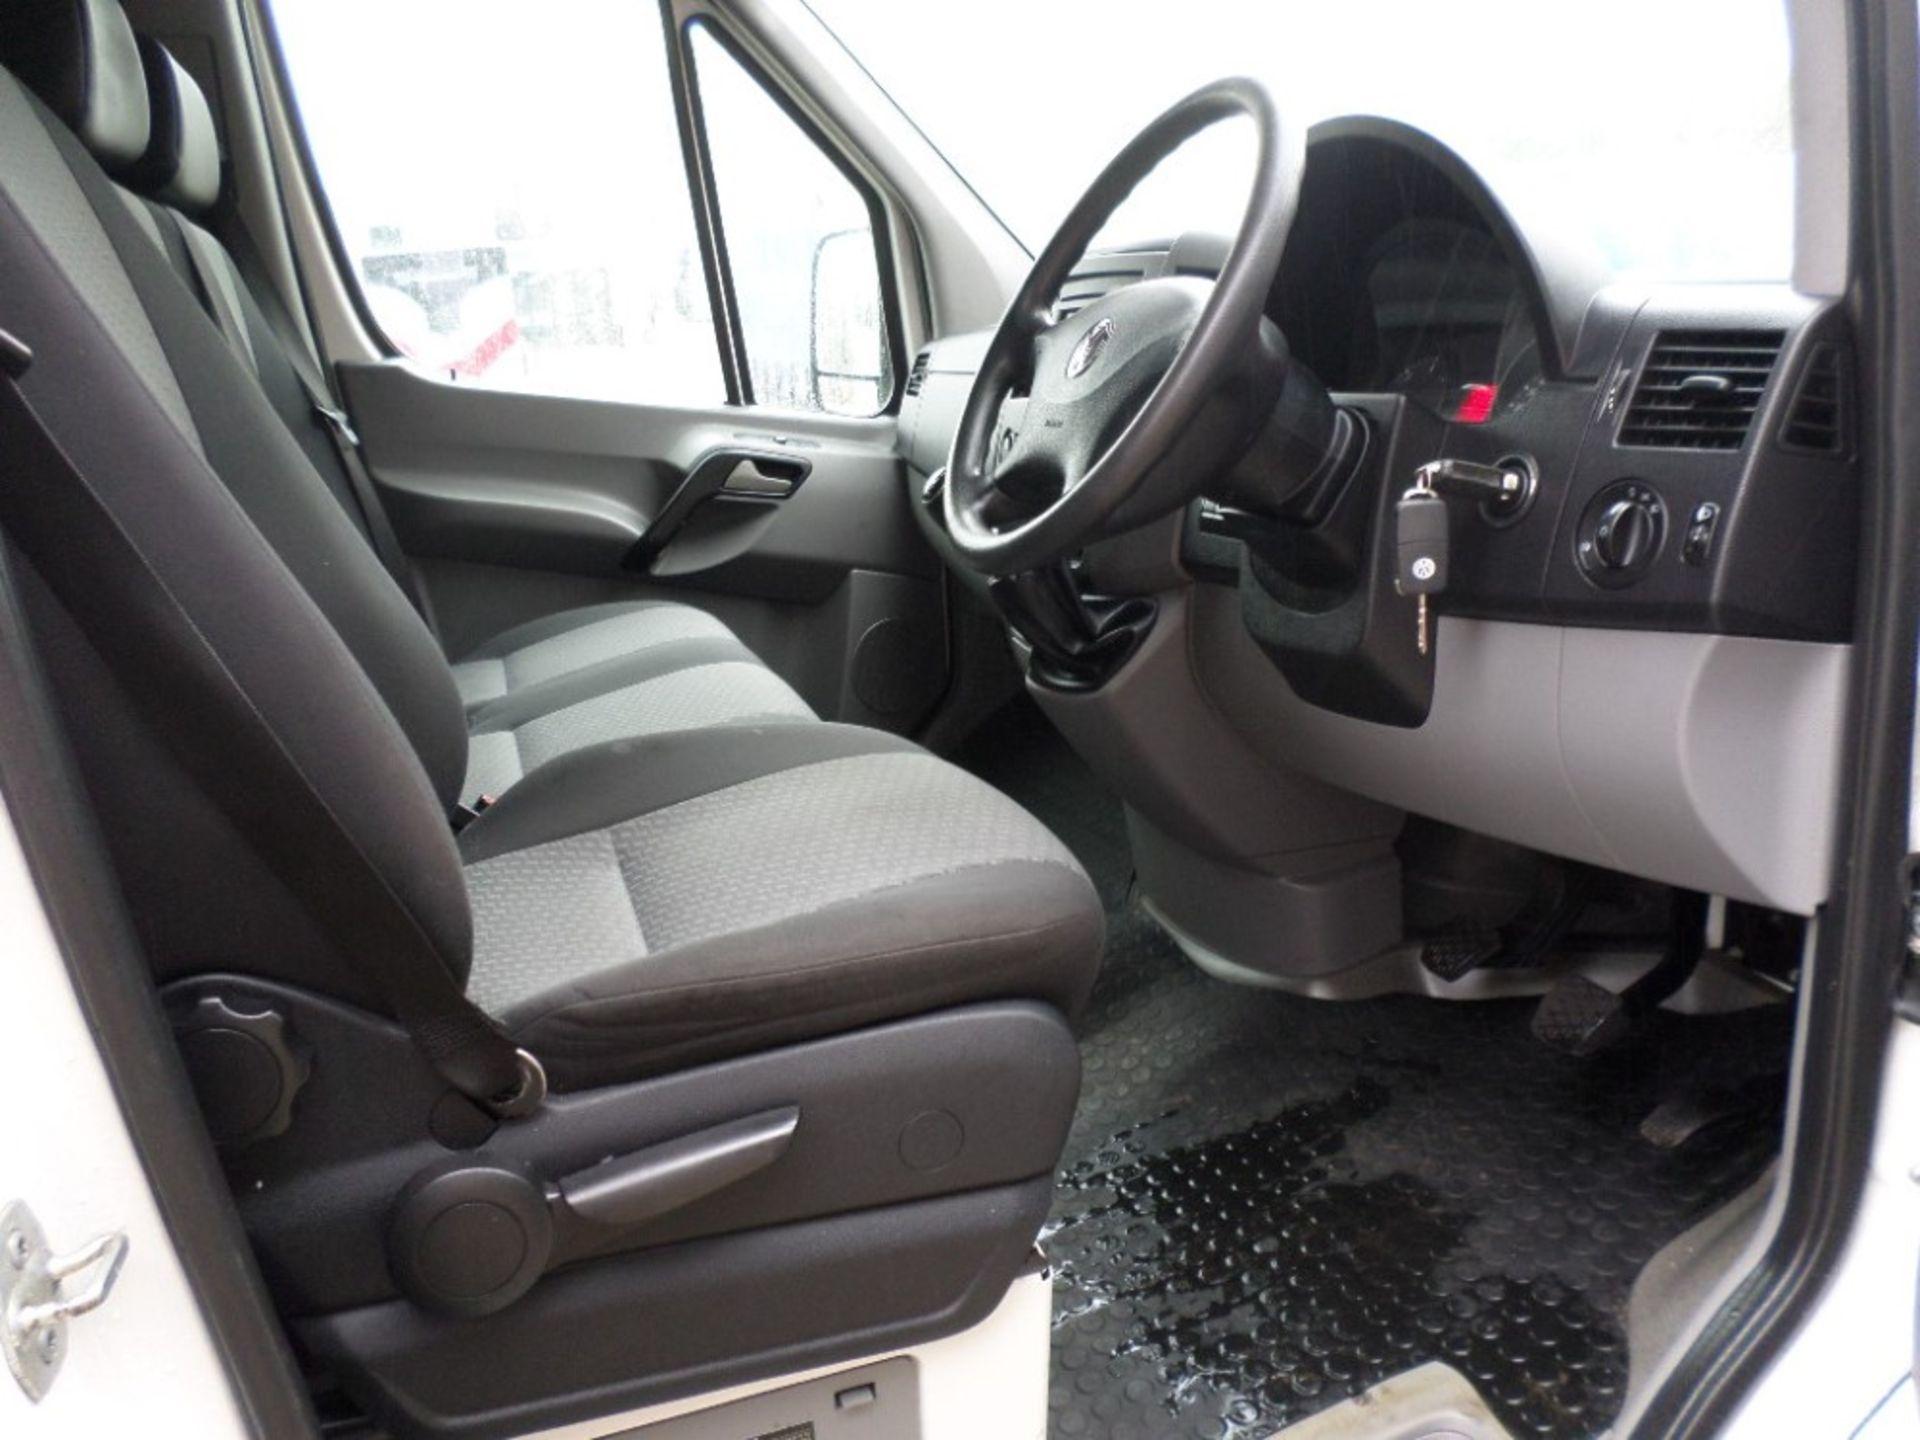 13 reg VW CRAFTER CR35 TDI 163 XLWB (LOCATION SHEFFIELD) 1ST REG 04/13, TEST 01/21, 97061M [+ VAT] - Image 6 of 6